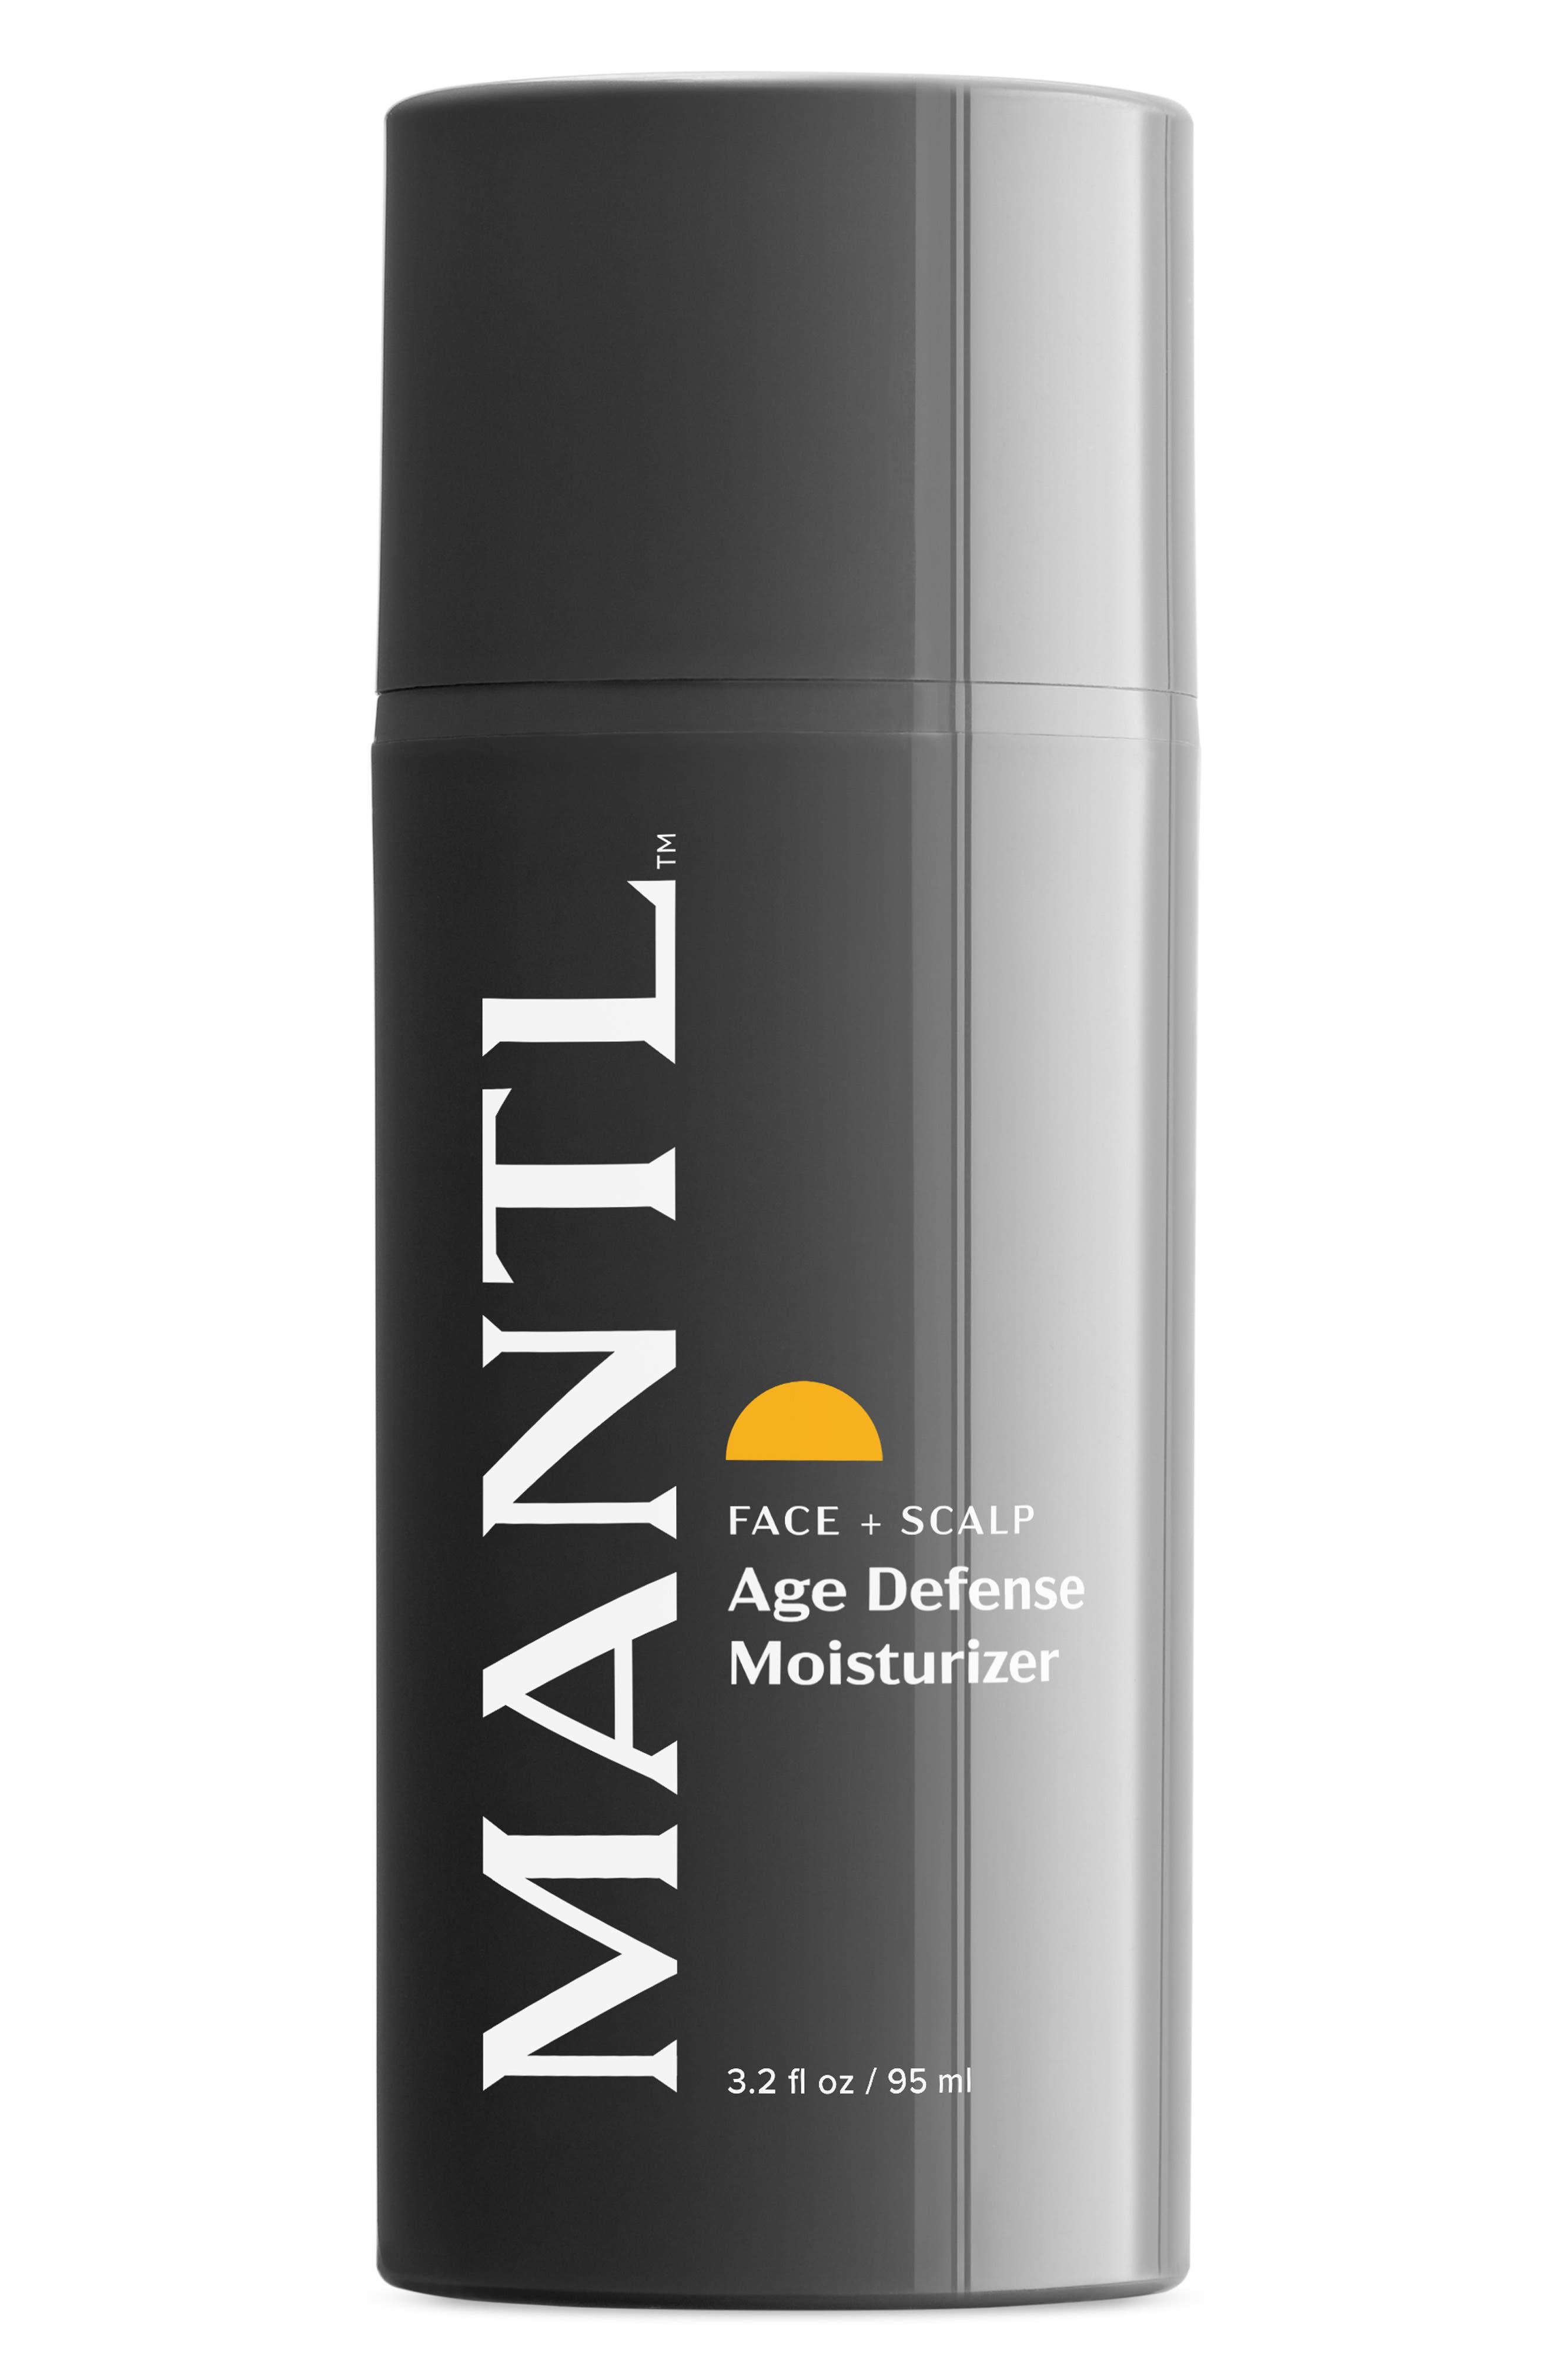 Face + Scalp Age Defense Moisturizer